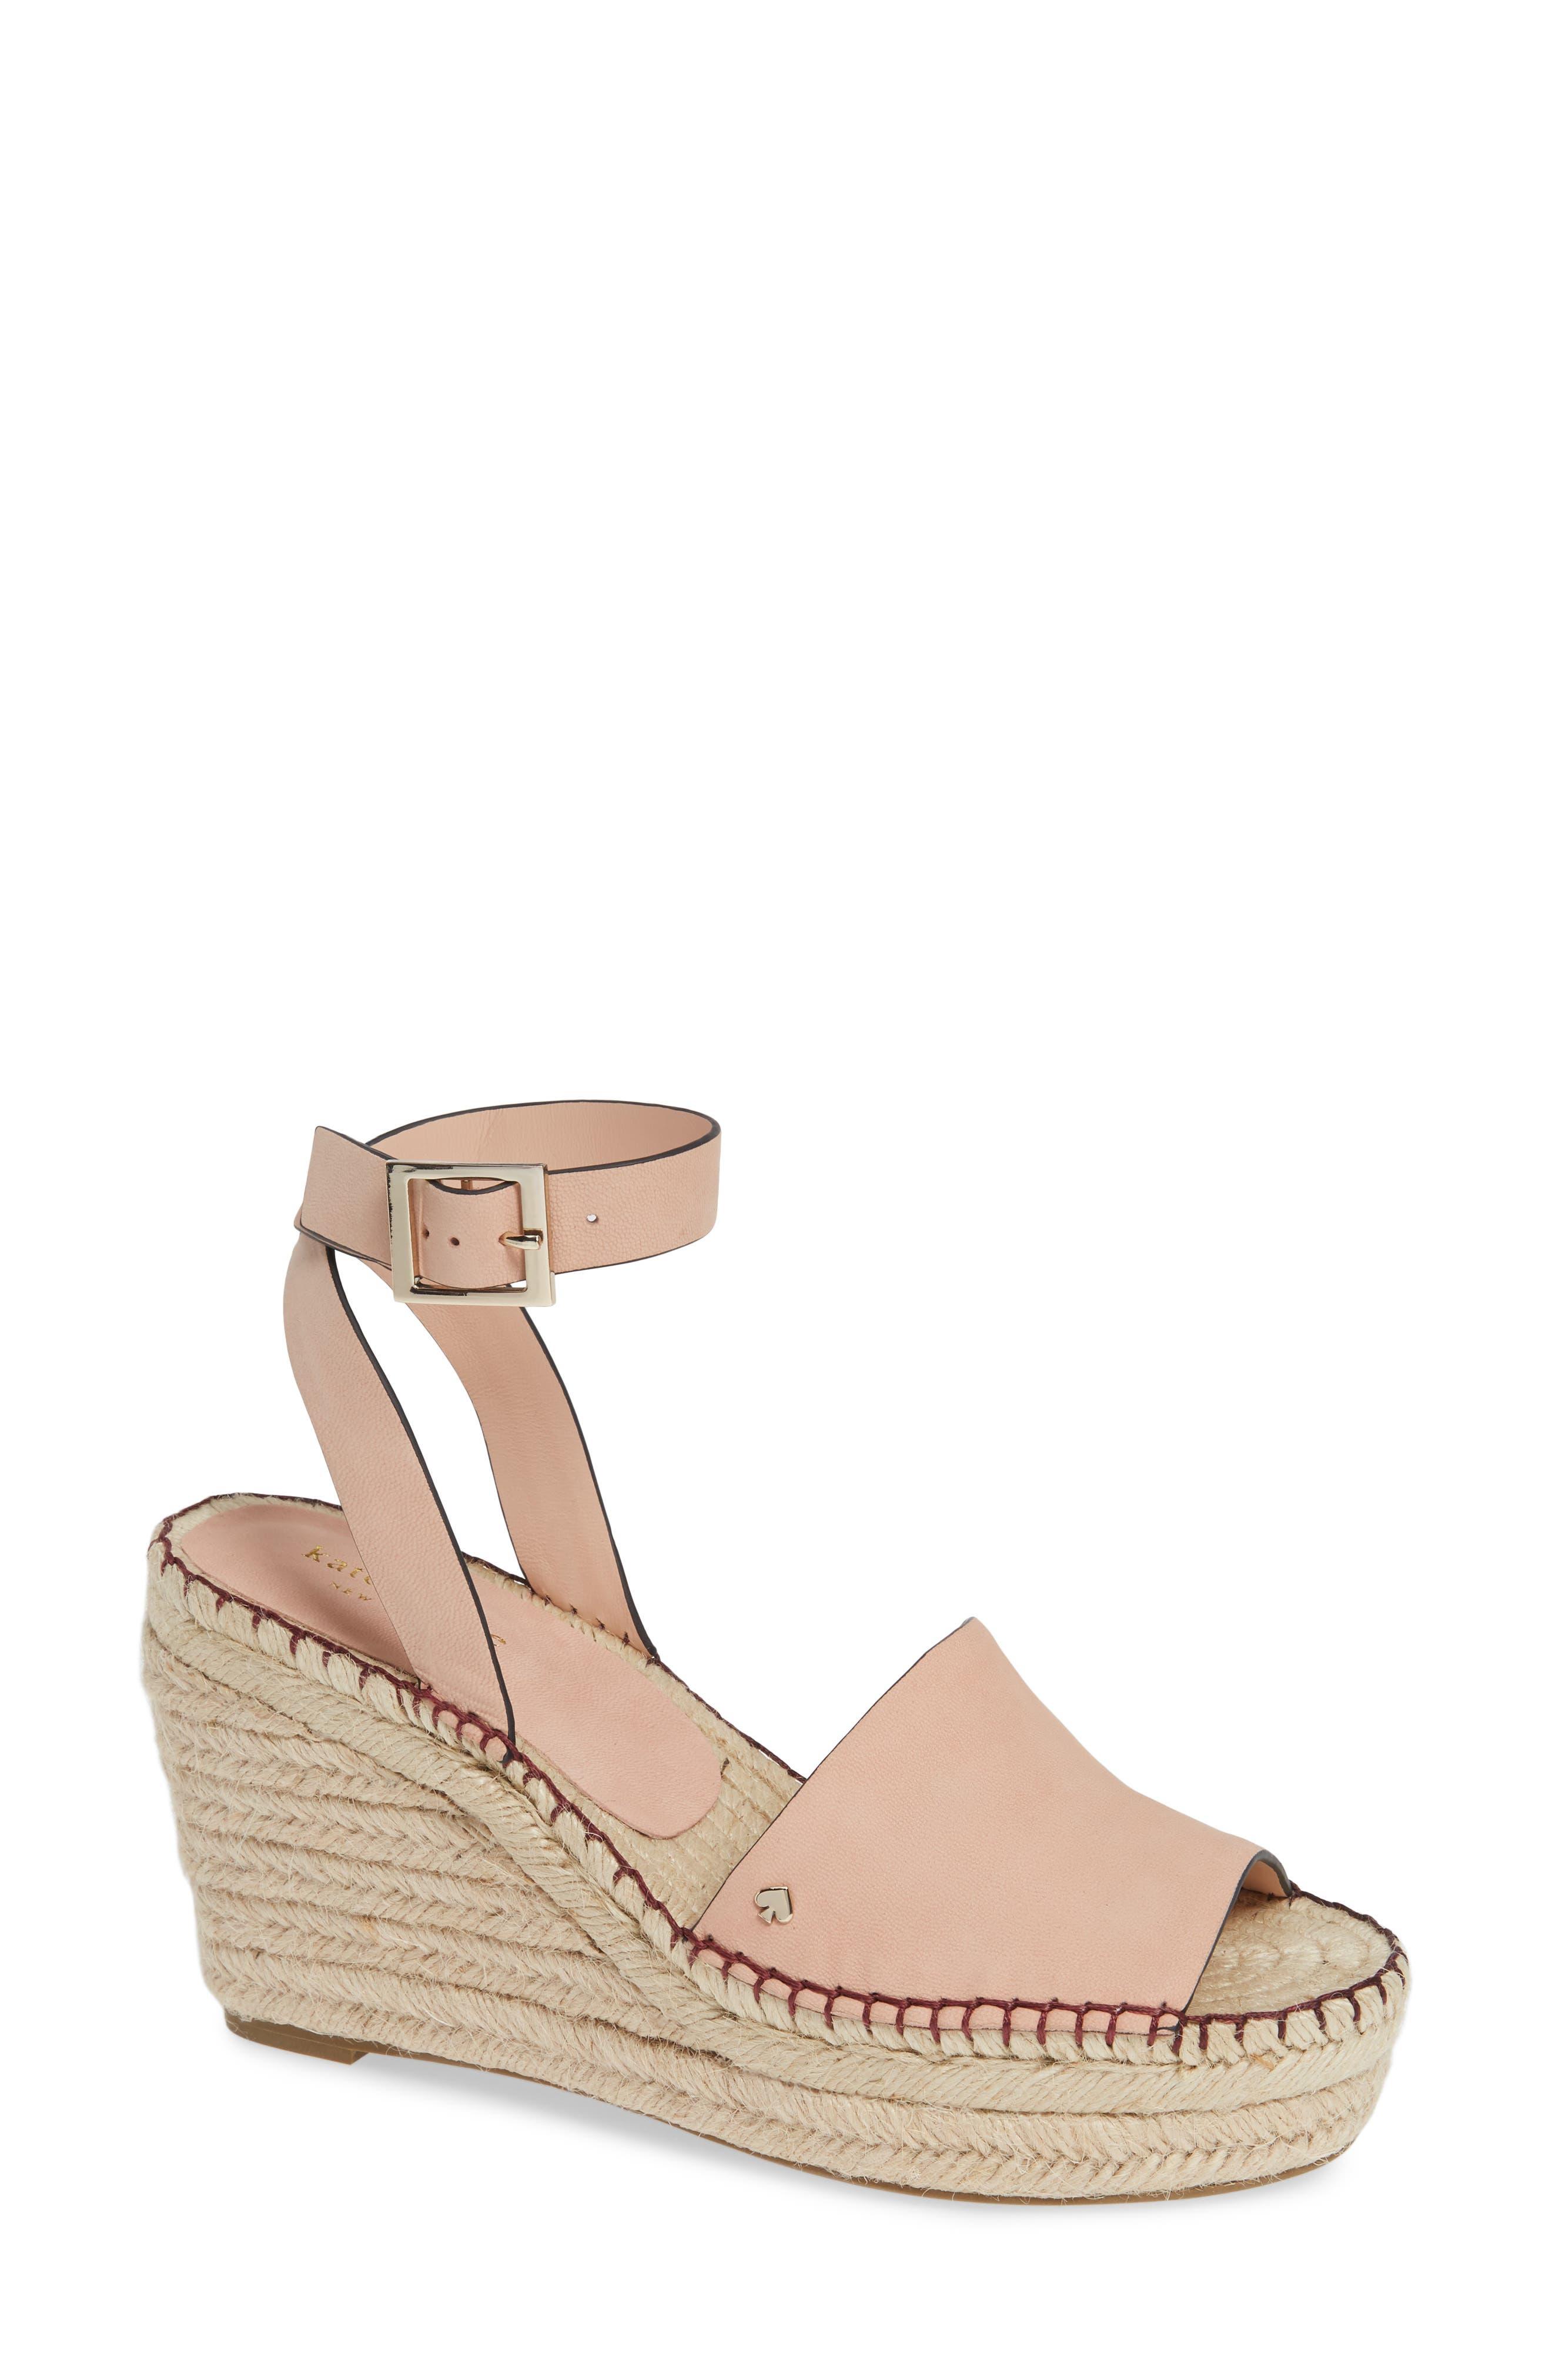 felipa wedge sandal, Main, color, CONCH SHELL NUBUK